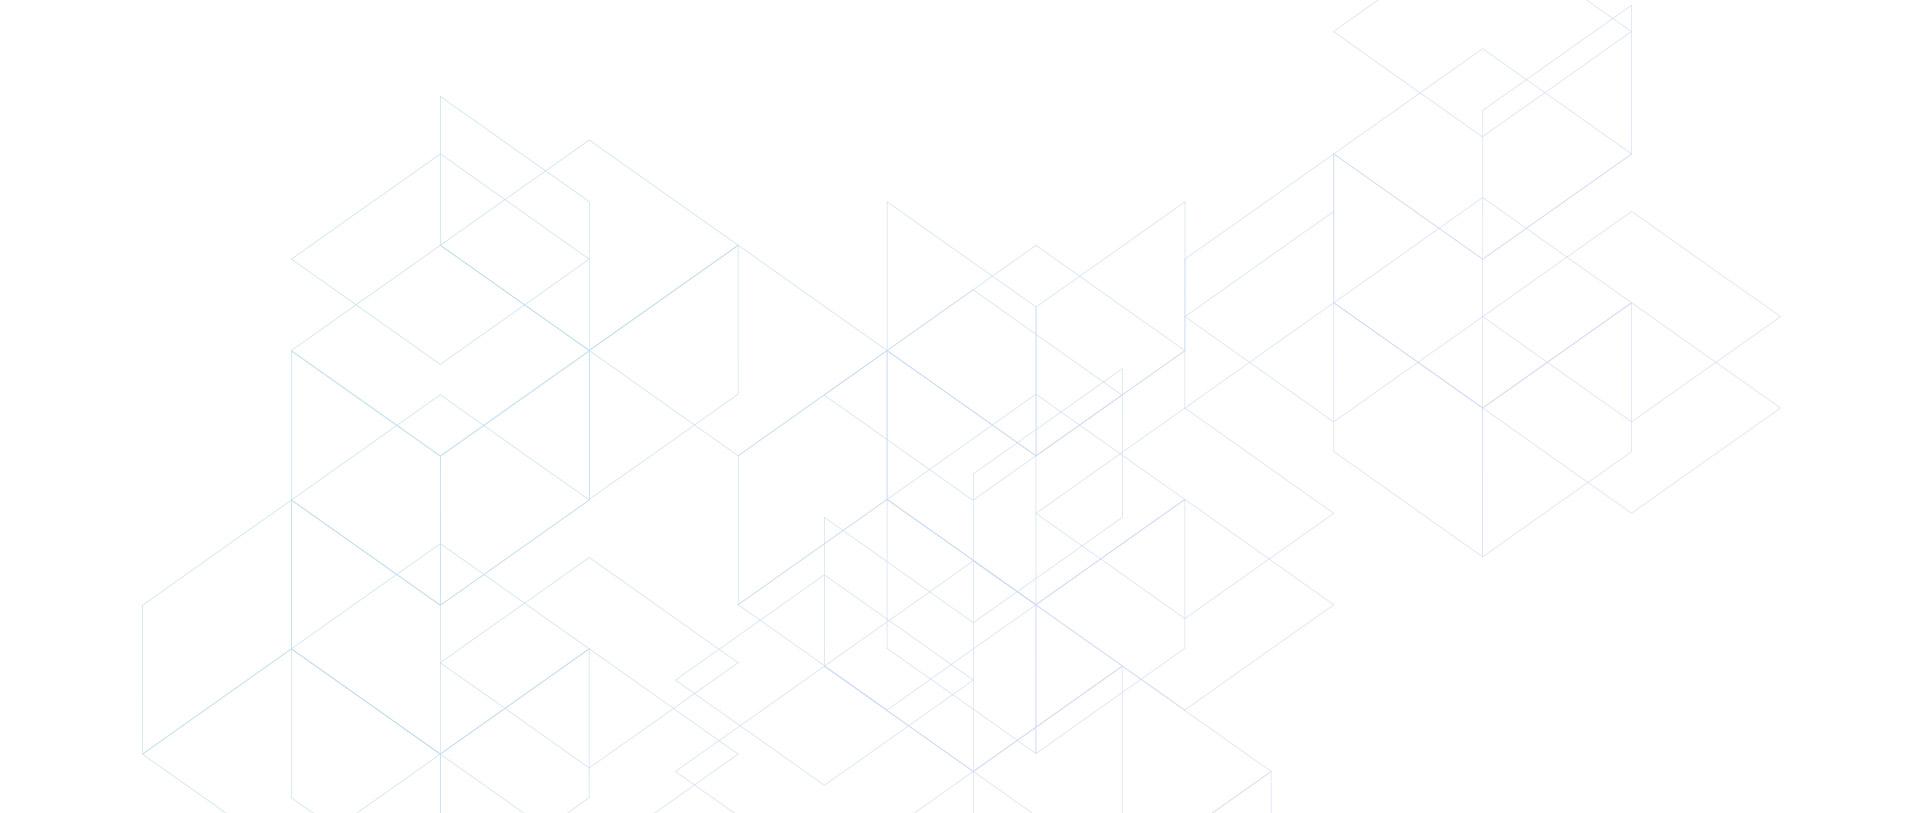 Collaboration background image